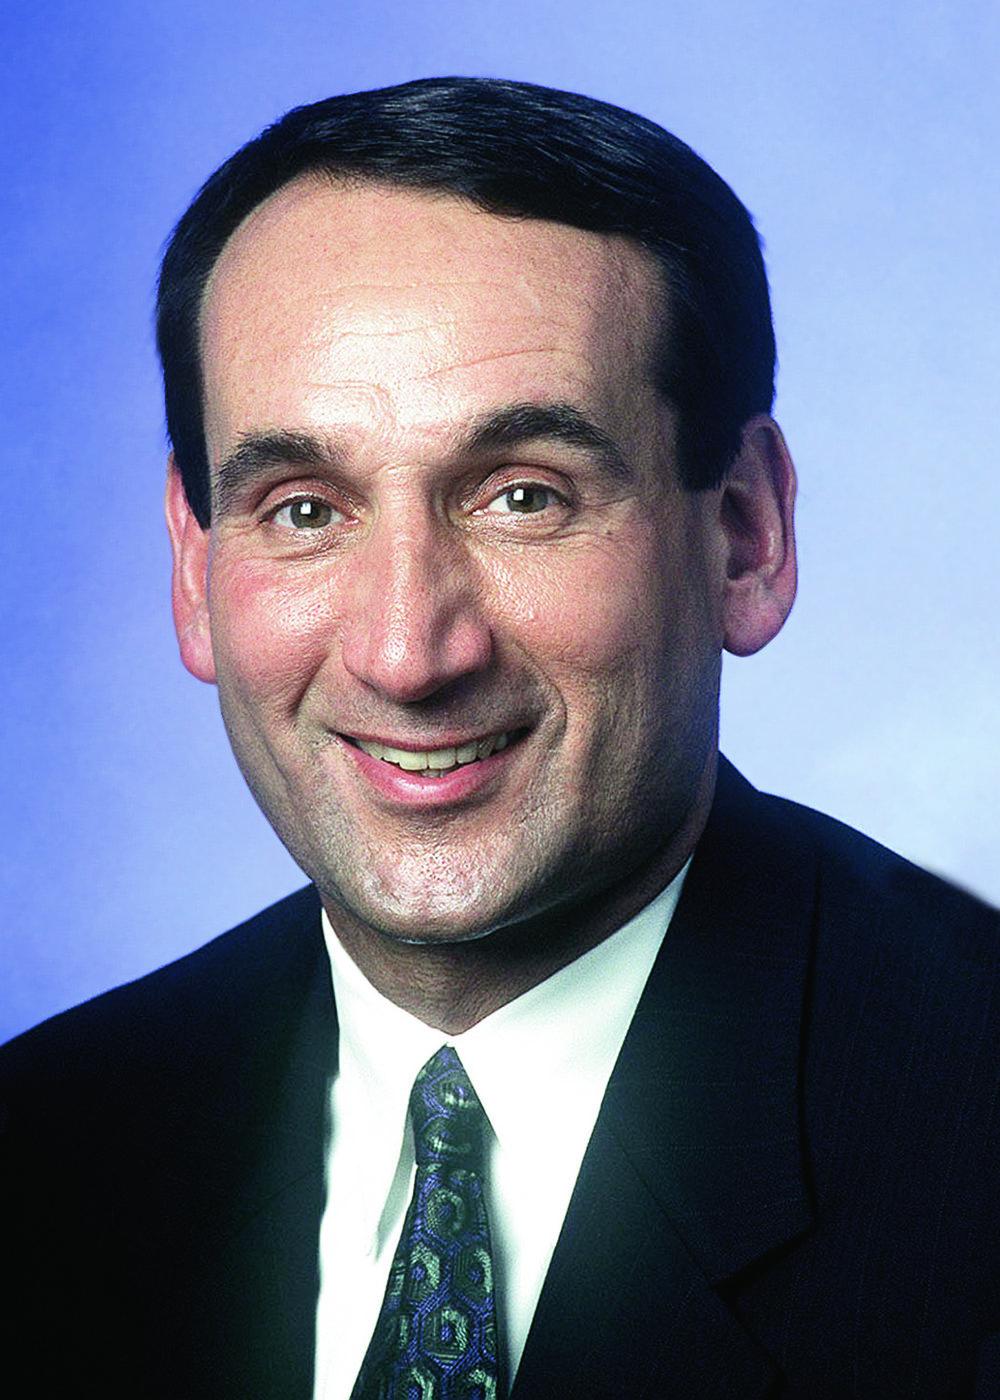 MIKE KRZYZEWSKI  HEAD MEN'S BASKETBALL COACH,  DUKE UNIVERSITY